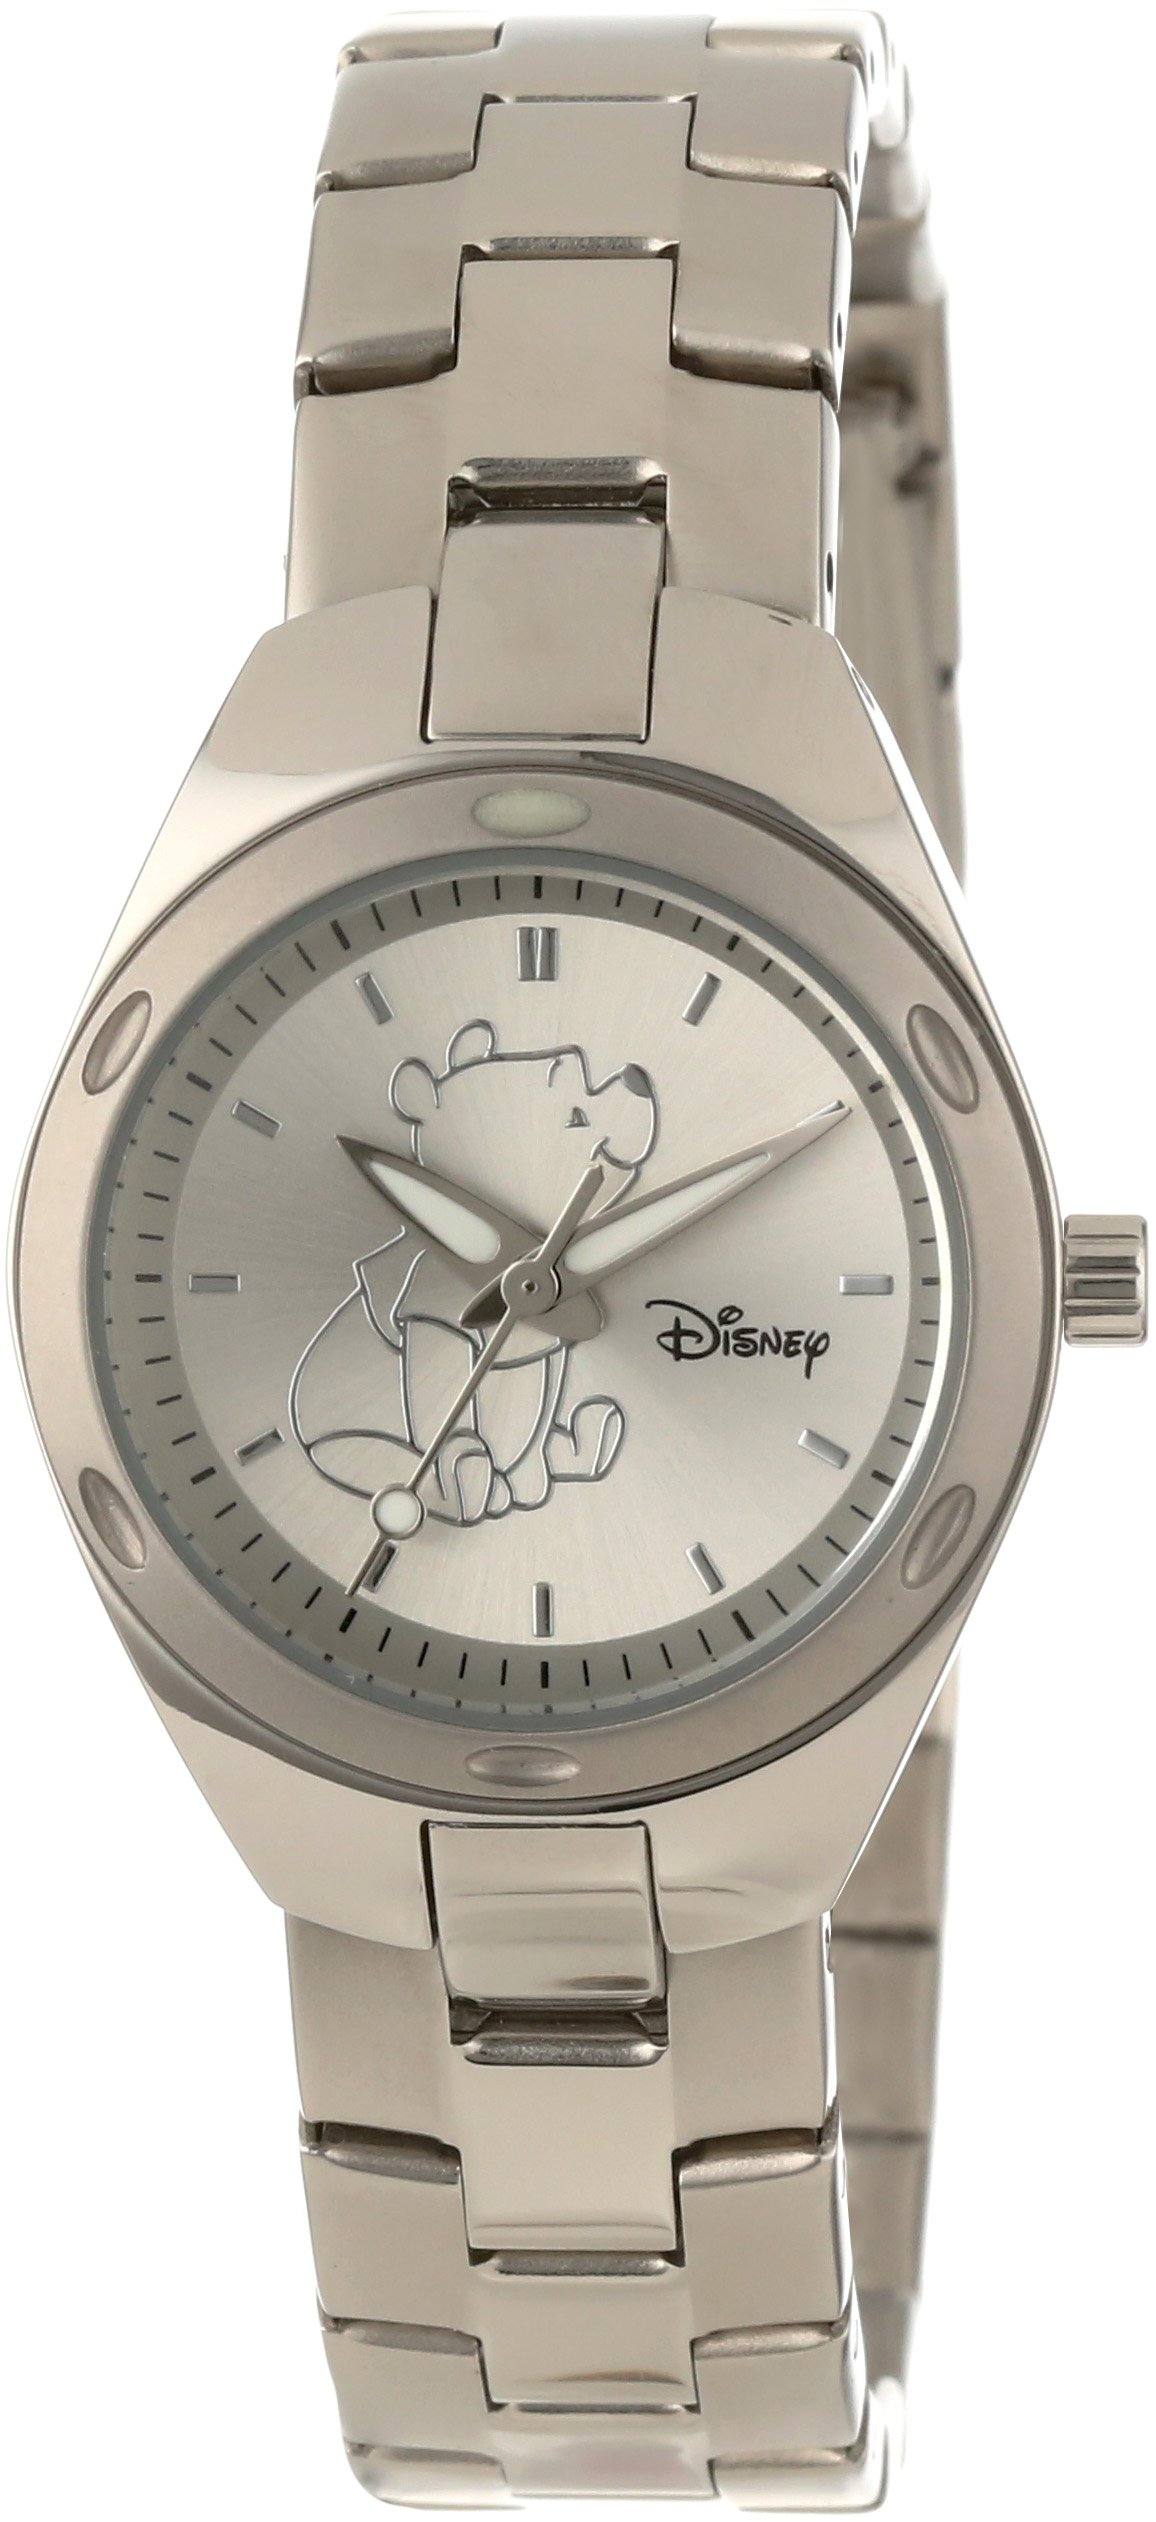 Disney Women's W000492 Winnie The Pooh Stainless Steel Bracelet Watch